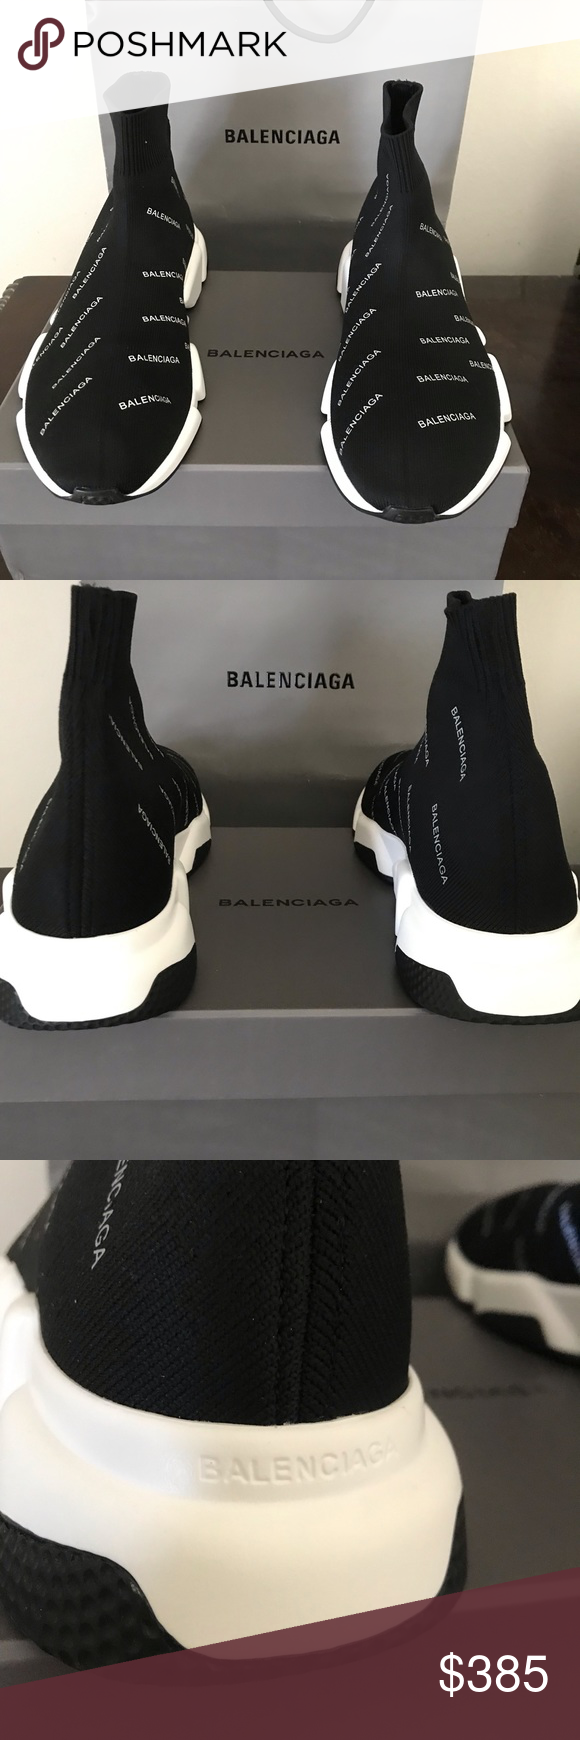 Euro size 45 Balenciaga Speed trainer